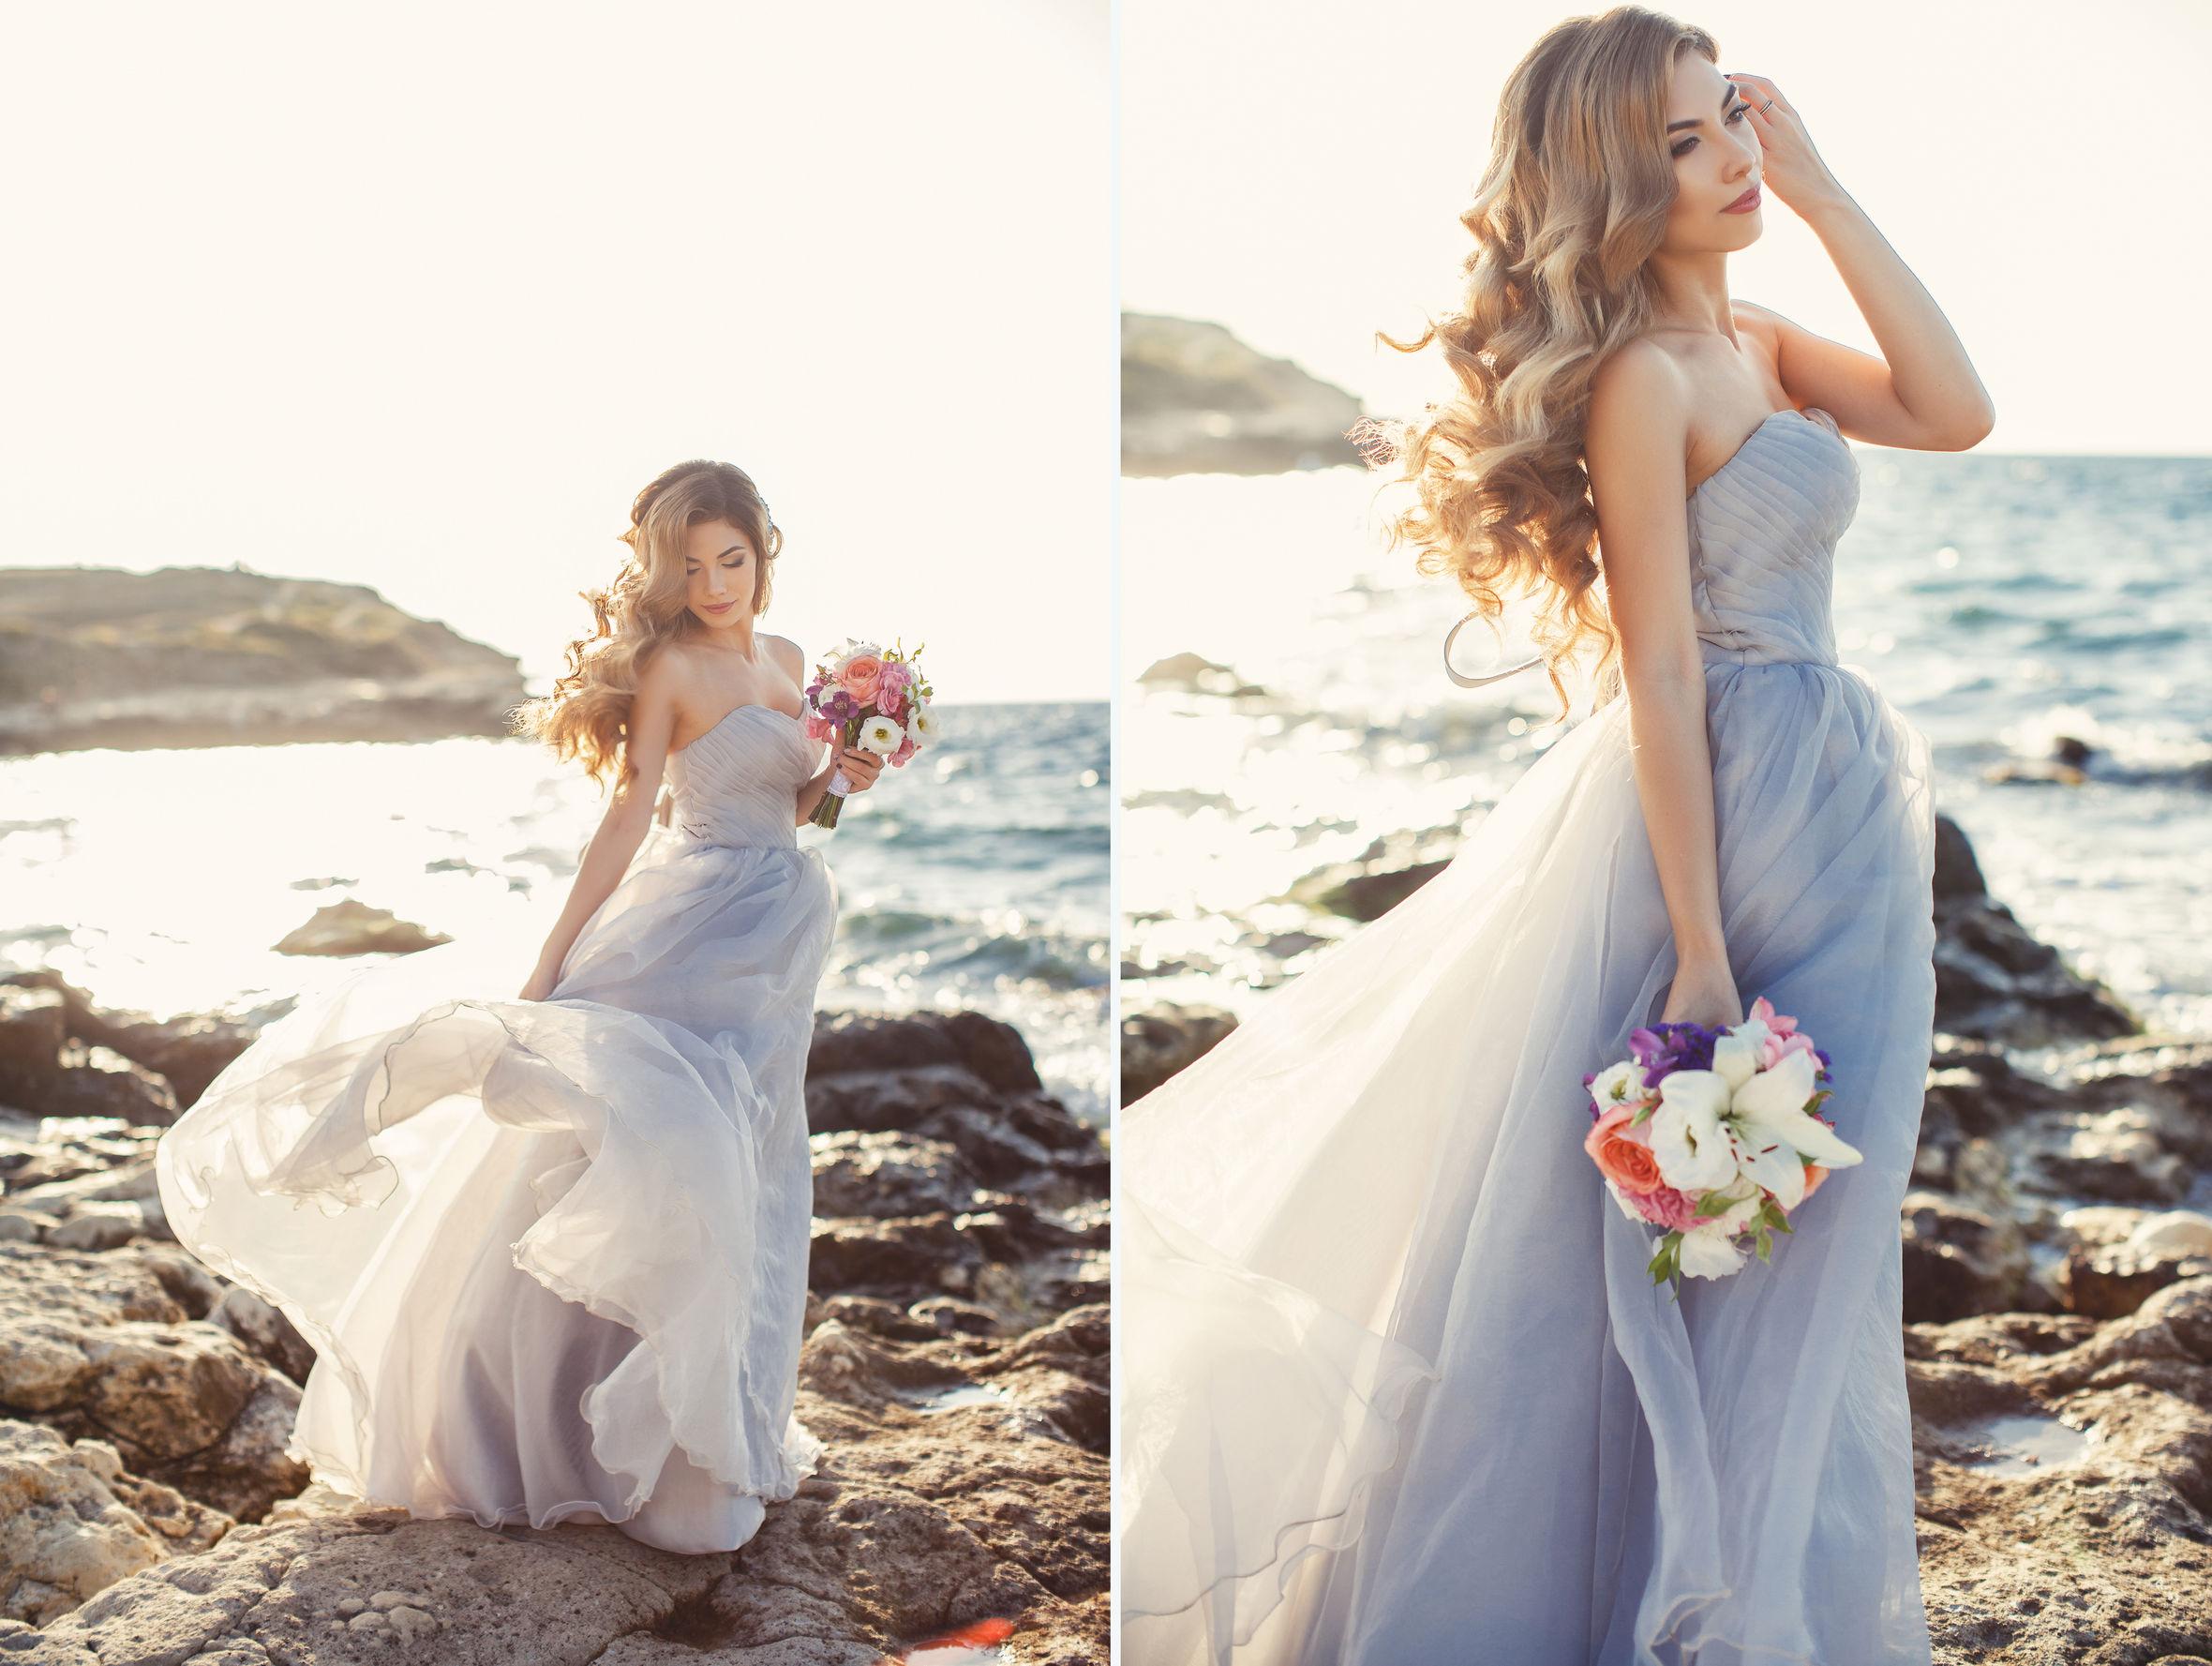 Professionele bruidsvisagie